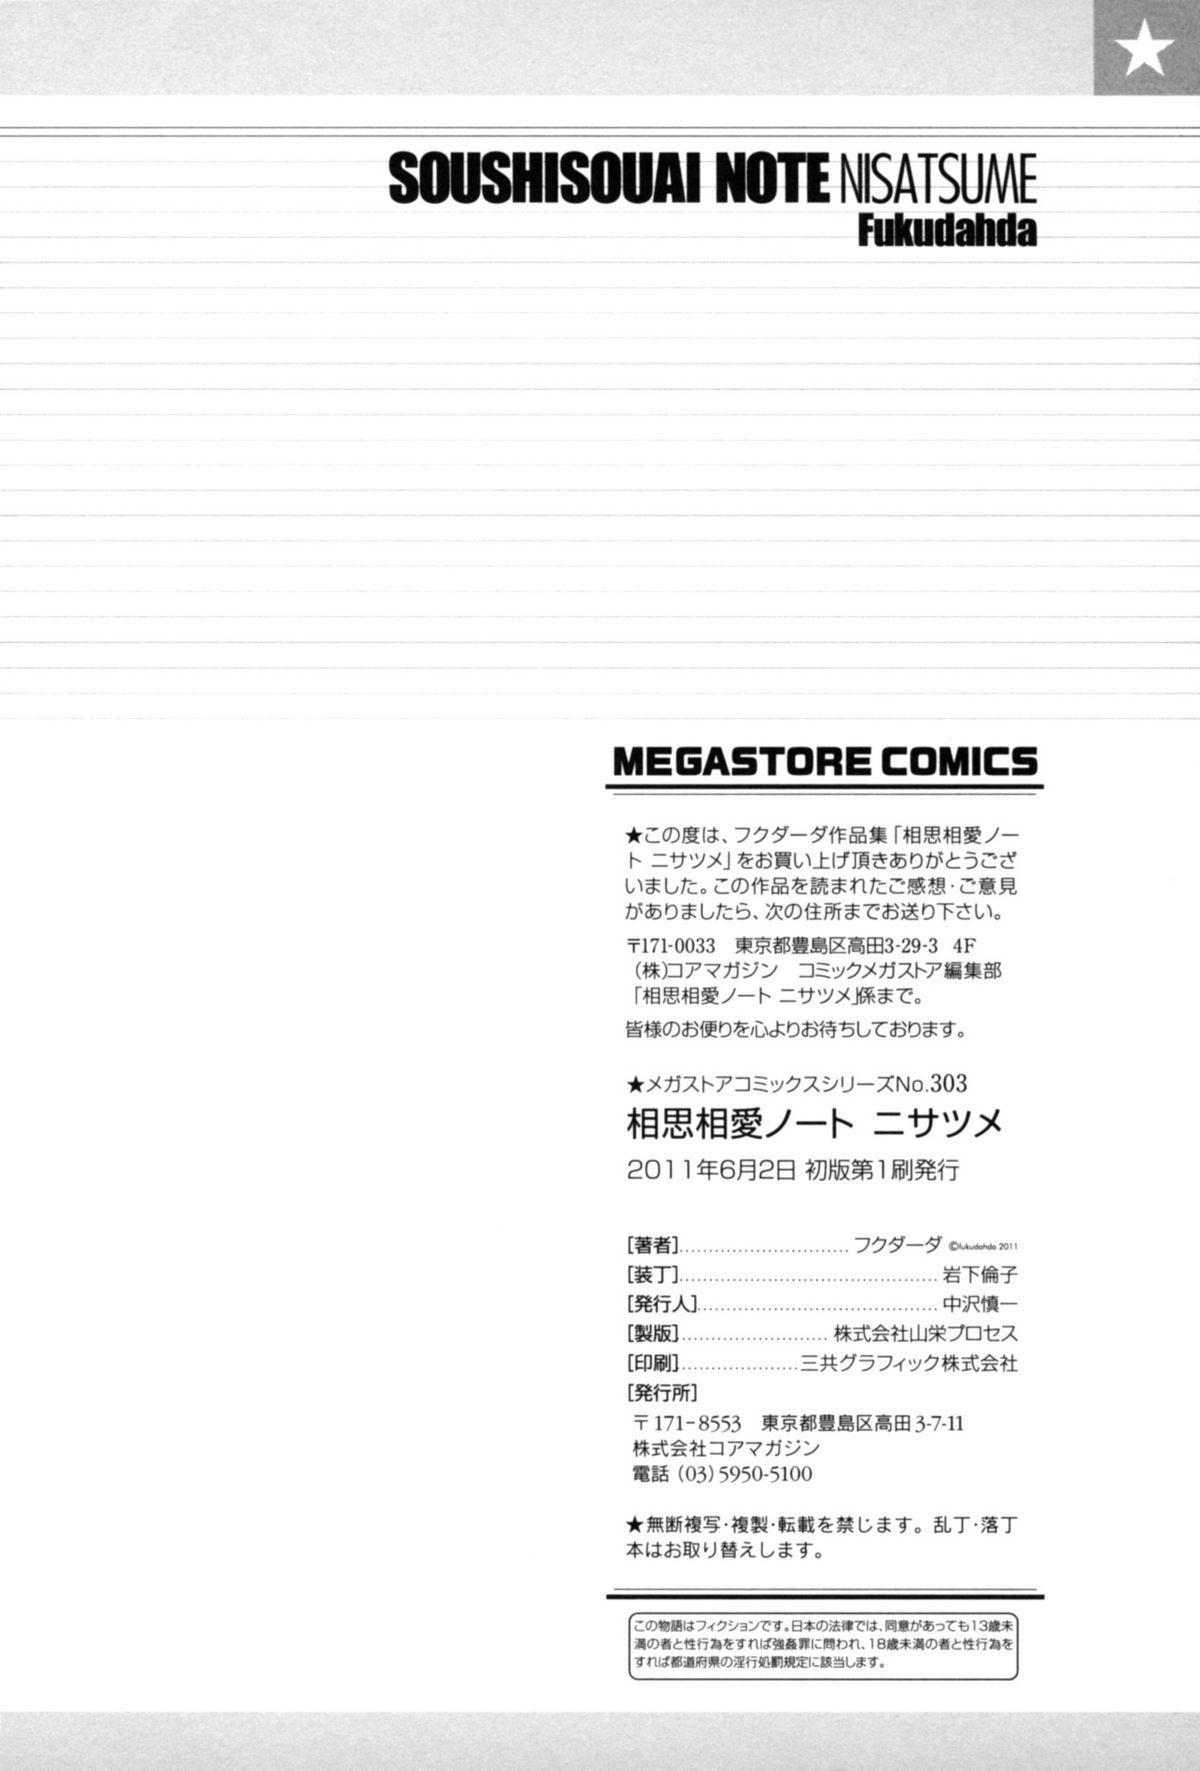 Soushisouai Note Nisatsume 231